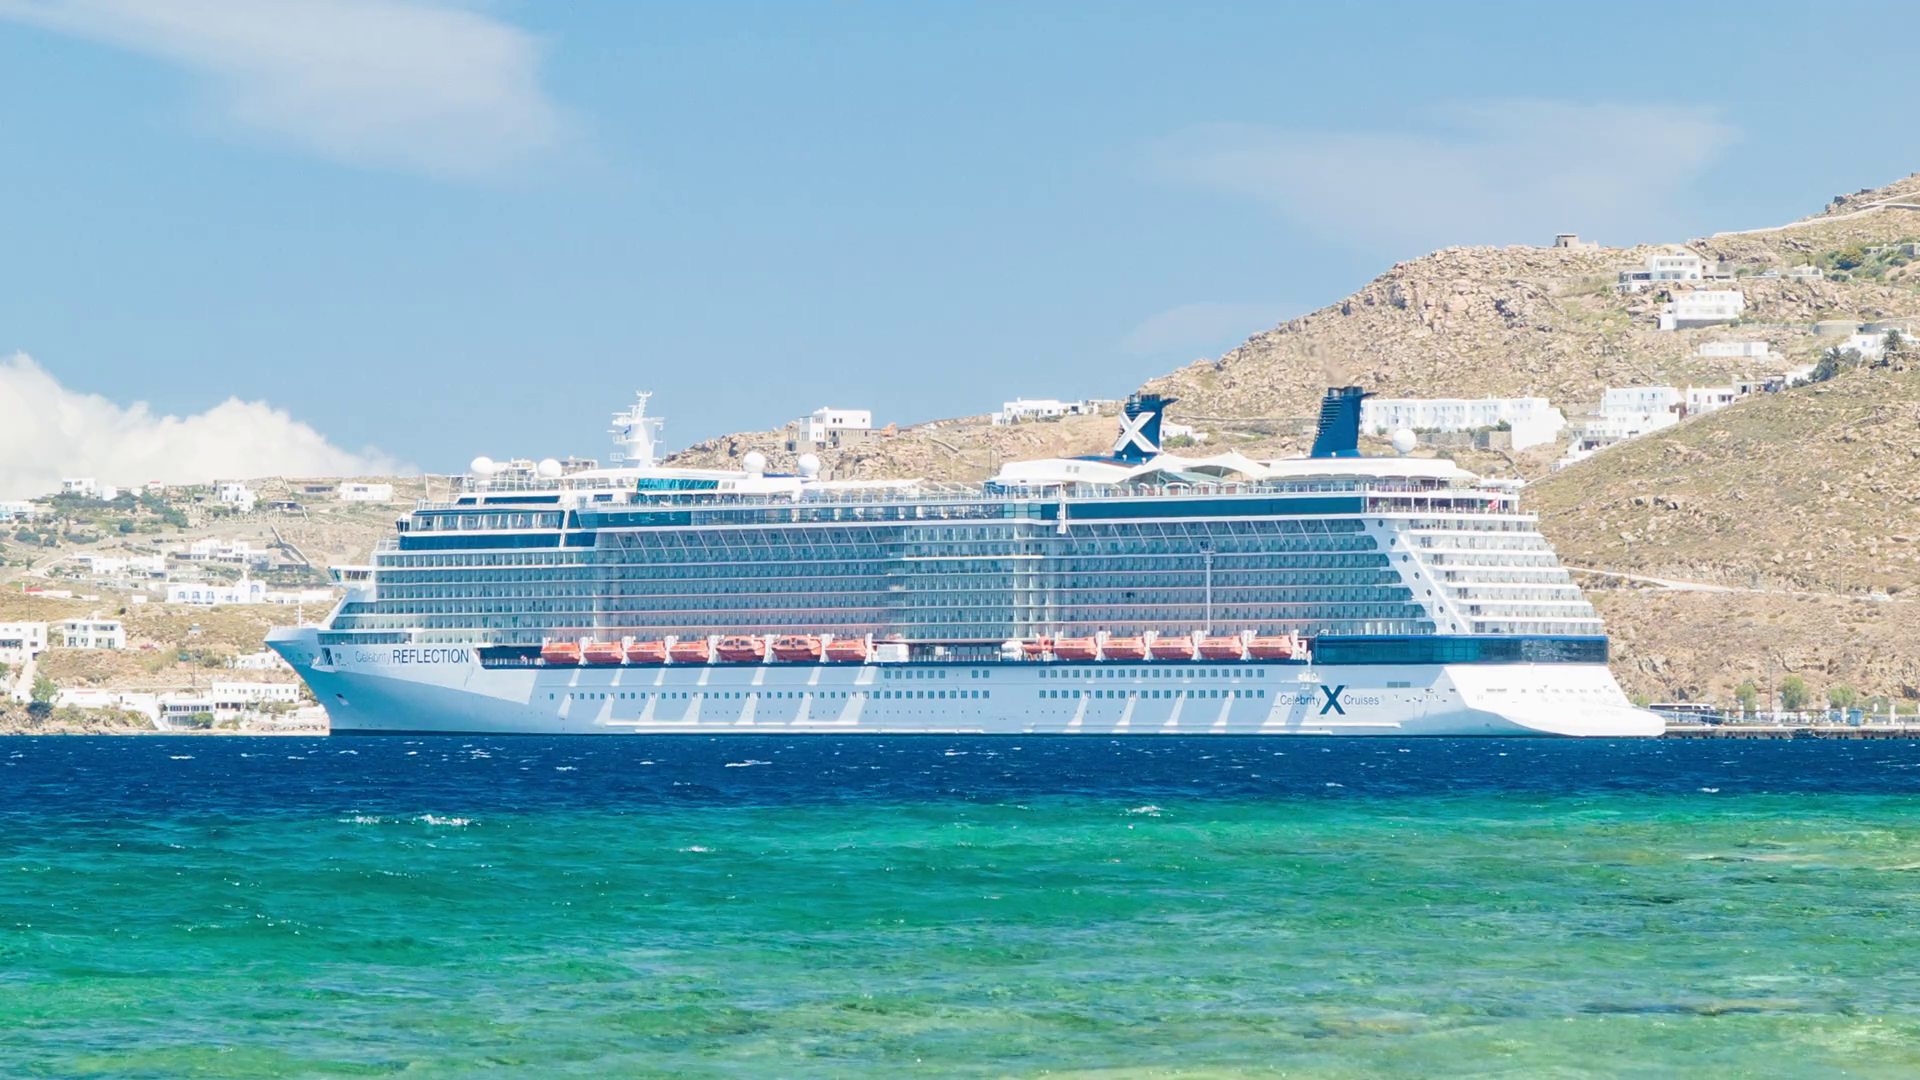 Celebrity Reflection Cruise Ship Docked in Mykonos Greece on a Sunny ...